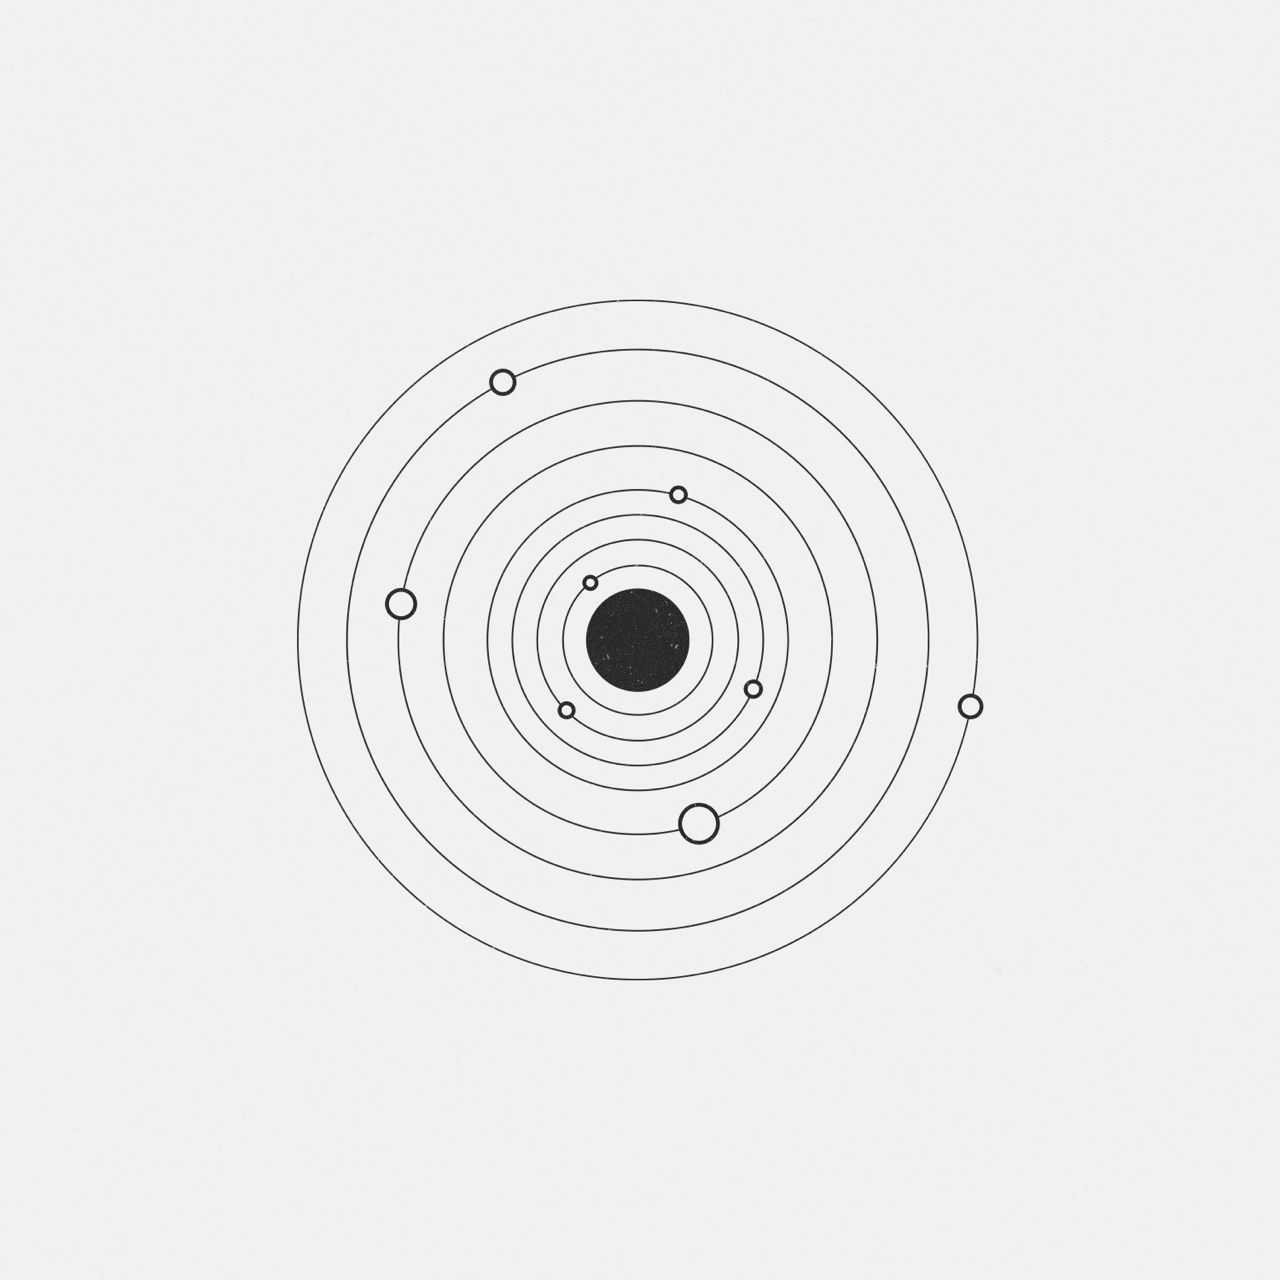 Ma16 513 A New Geometric Design Every Day